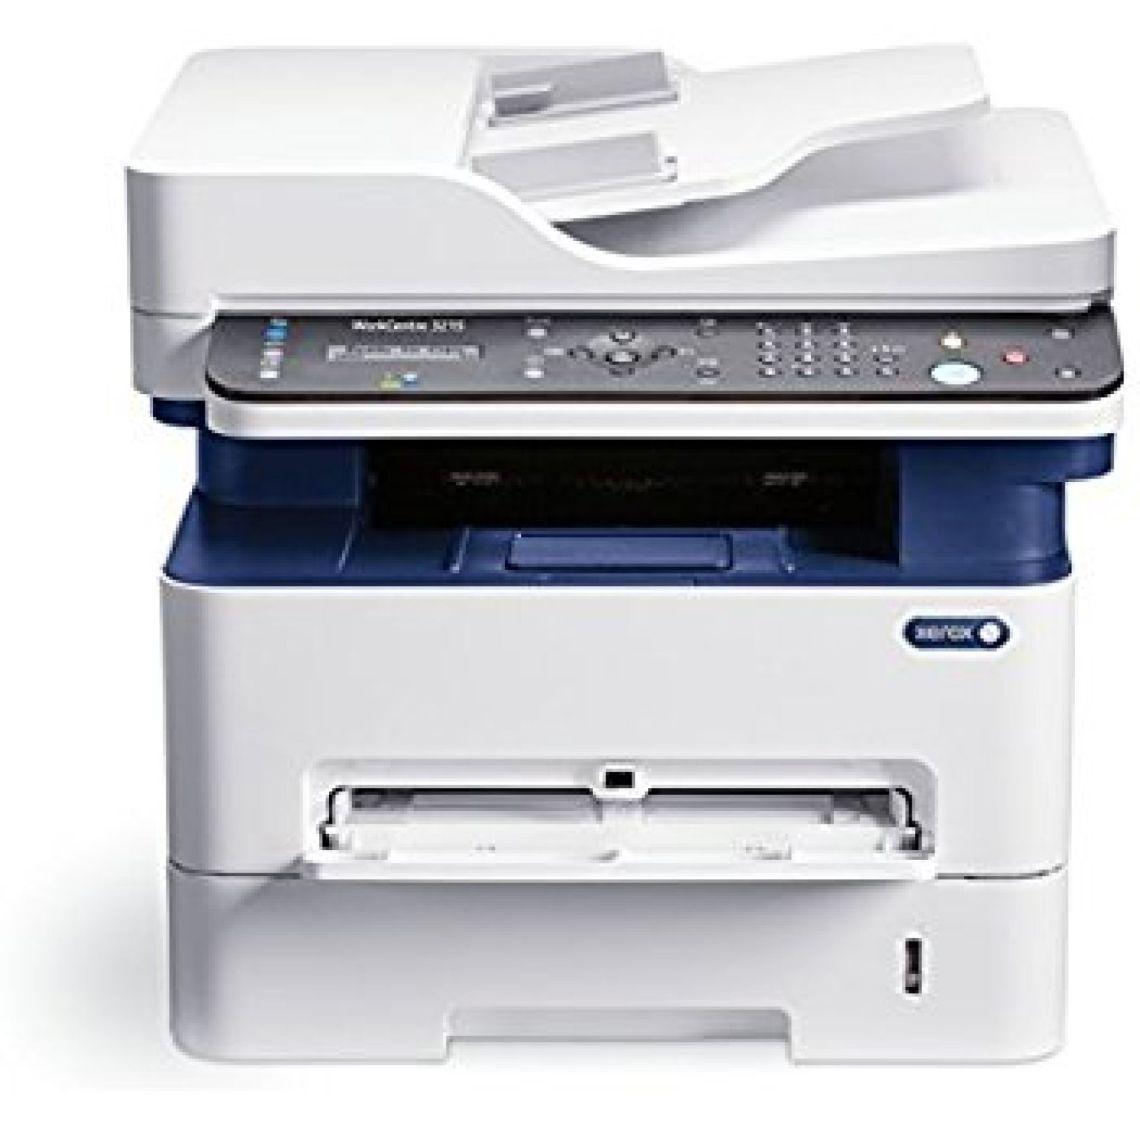 Amazon.com: Xerox WorkCentre 3215/NI Monochrome Multifunction Printer: Electronics